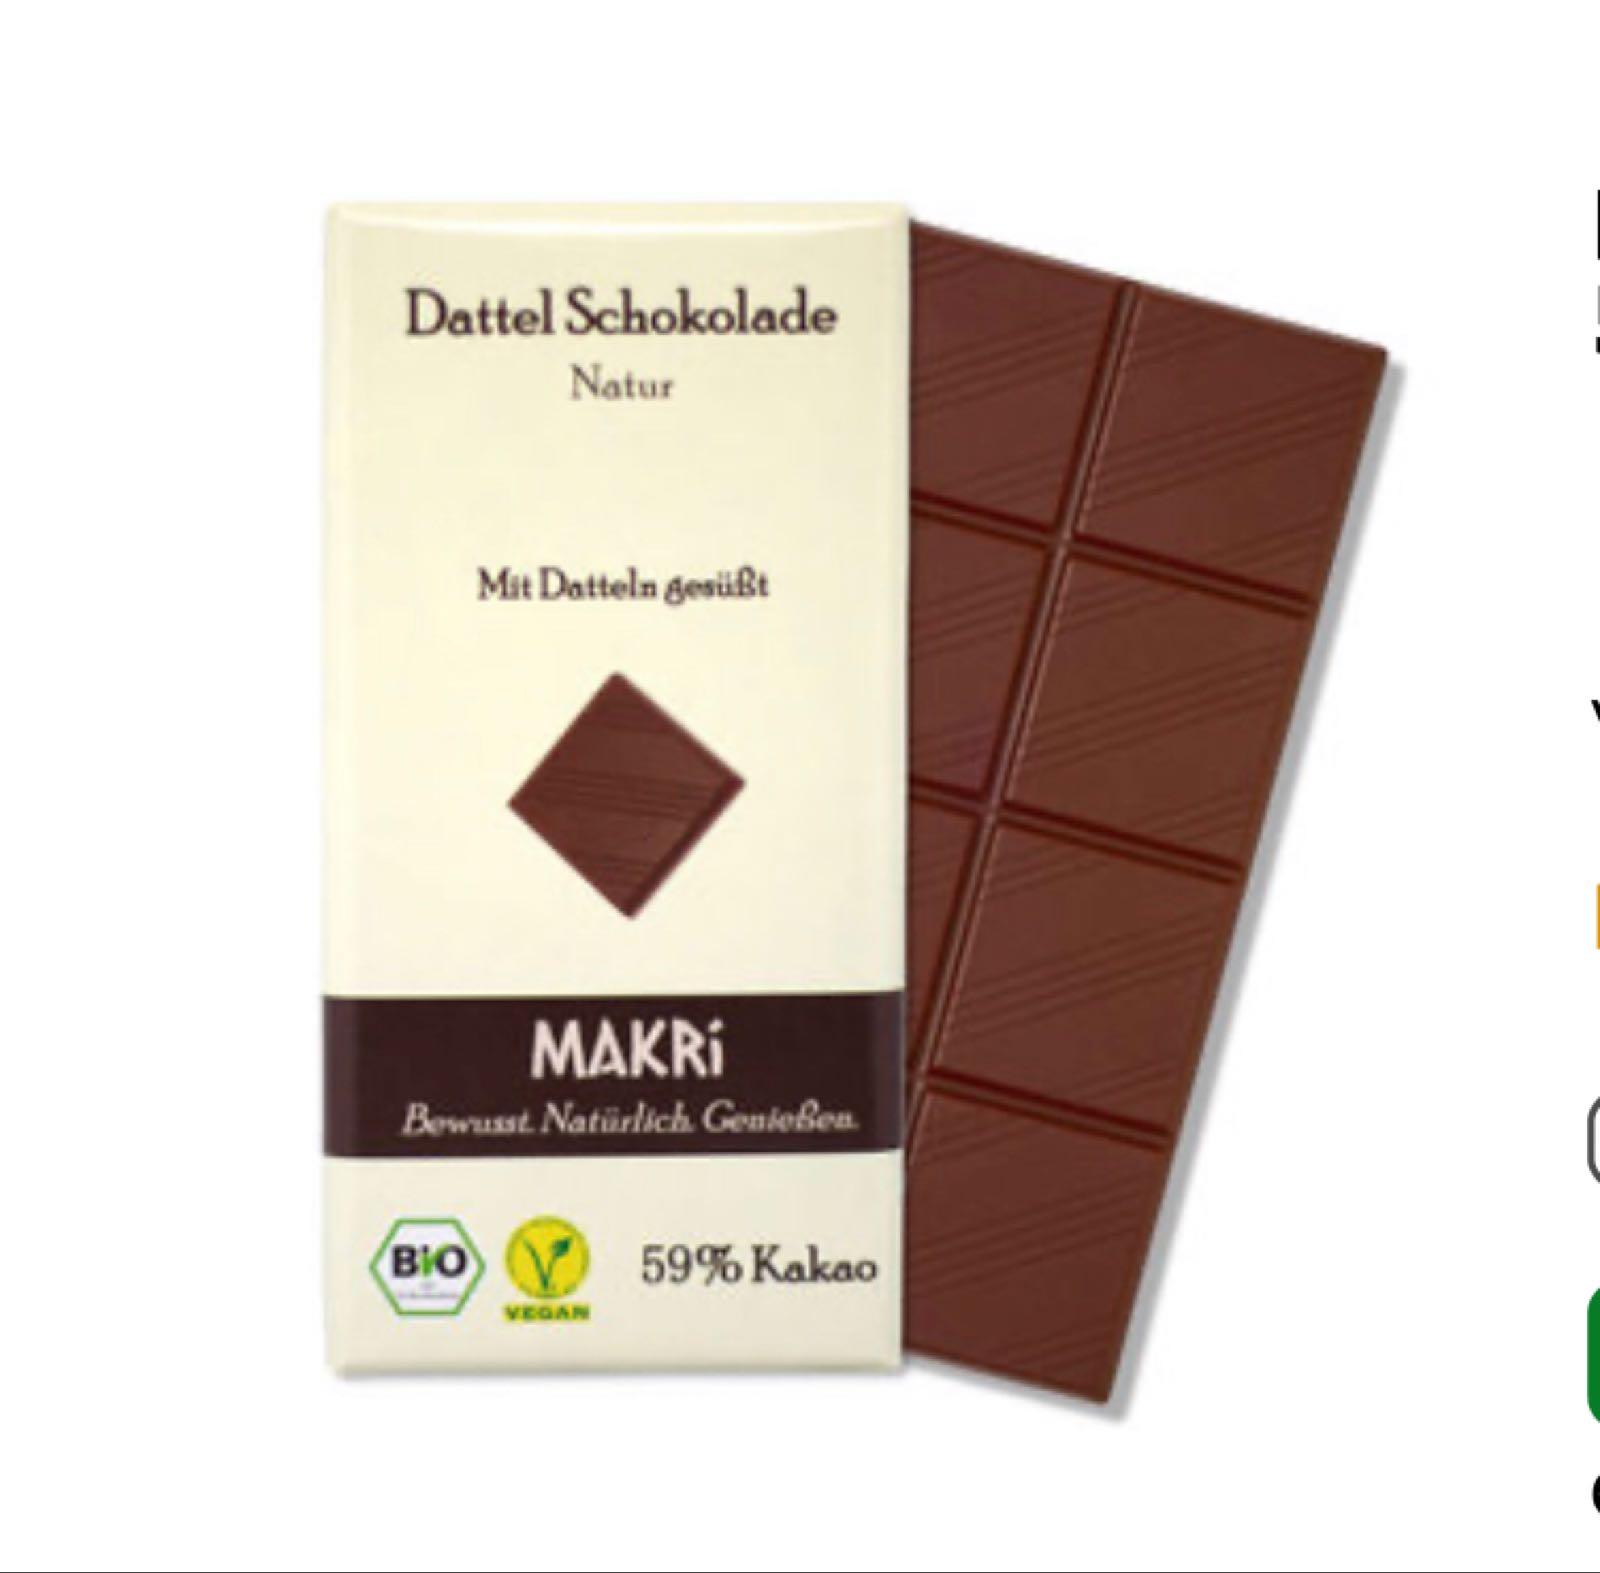 Dattel-Schokolade